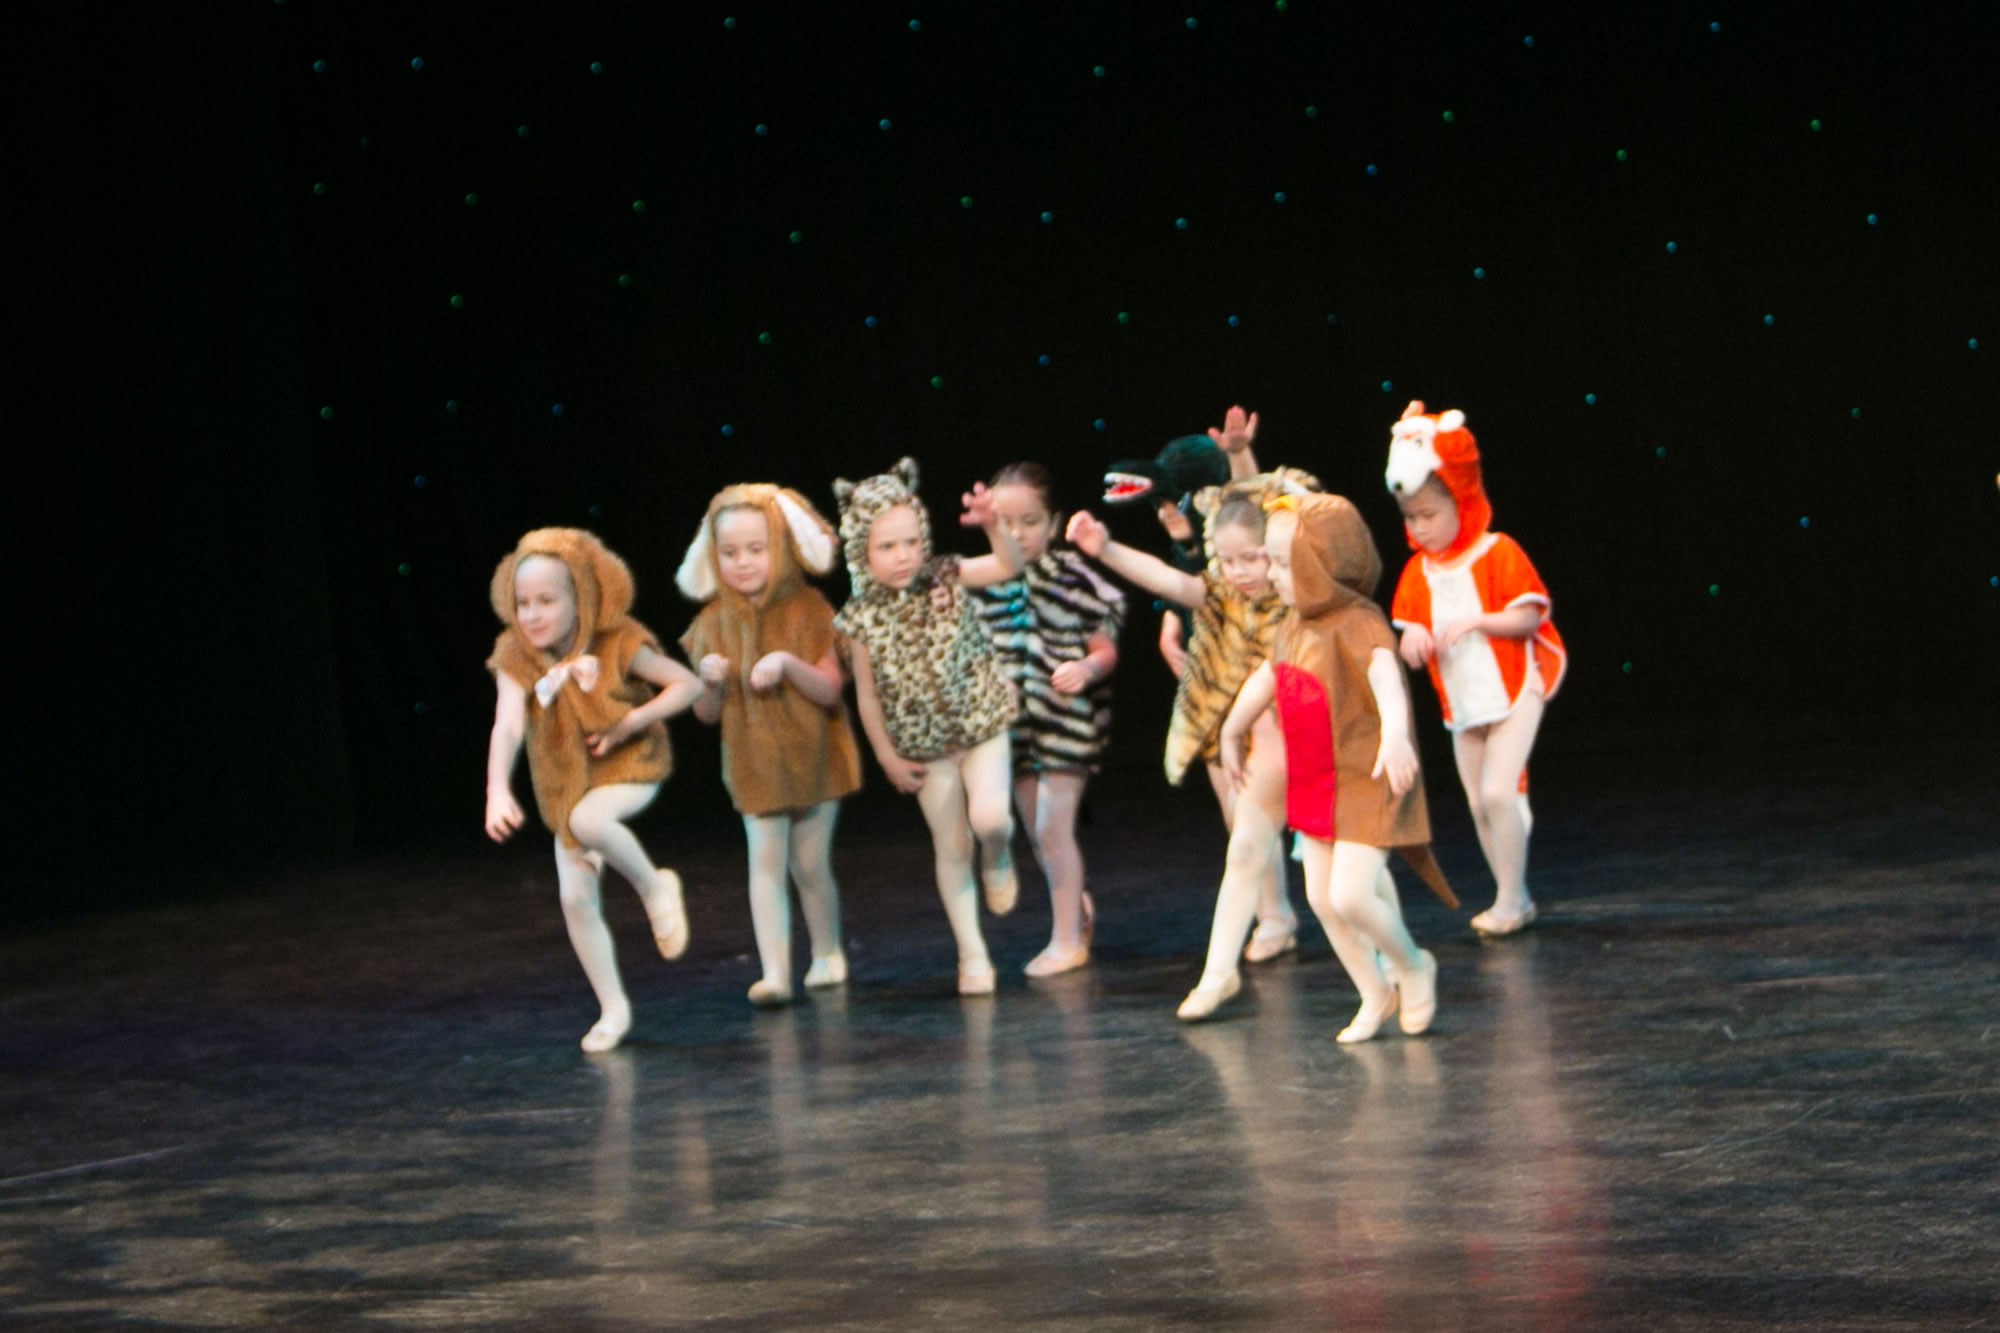 Hitchin_School_of_Dance_Show_2019-SM1_2133.jpg